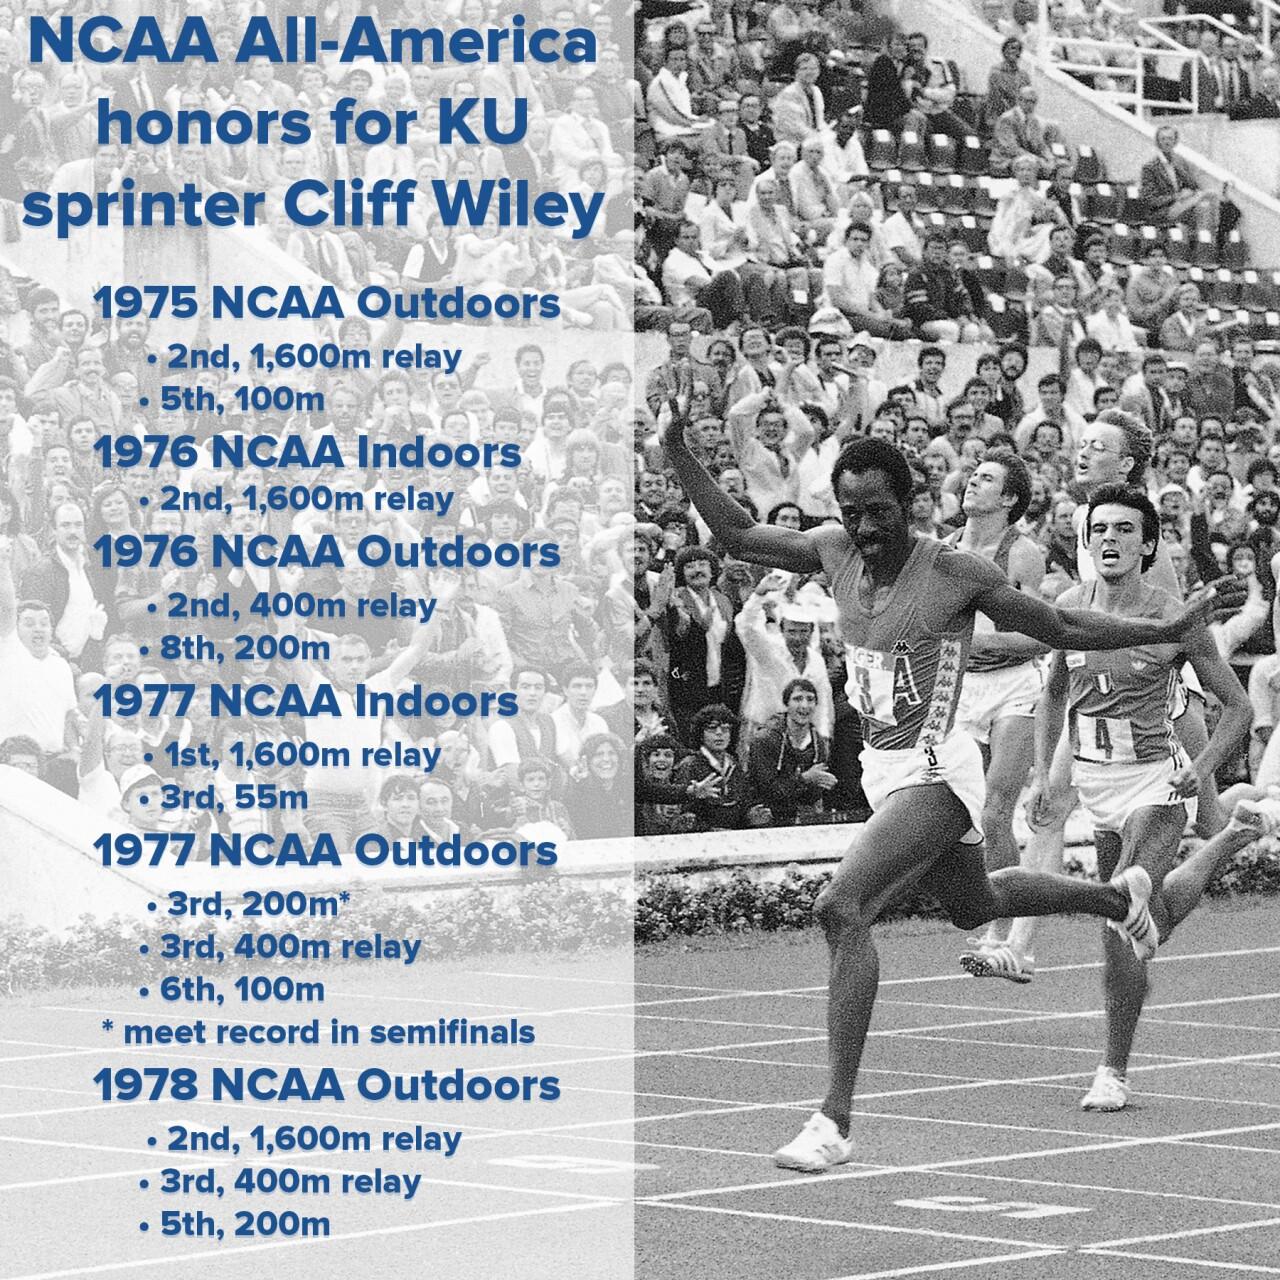 Cliif Wiley All-America.jpg